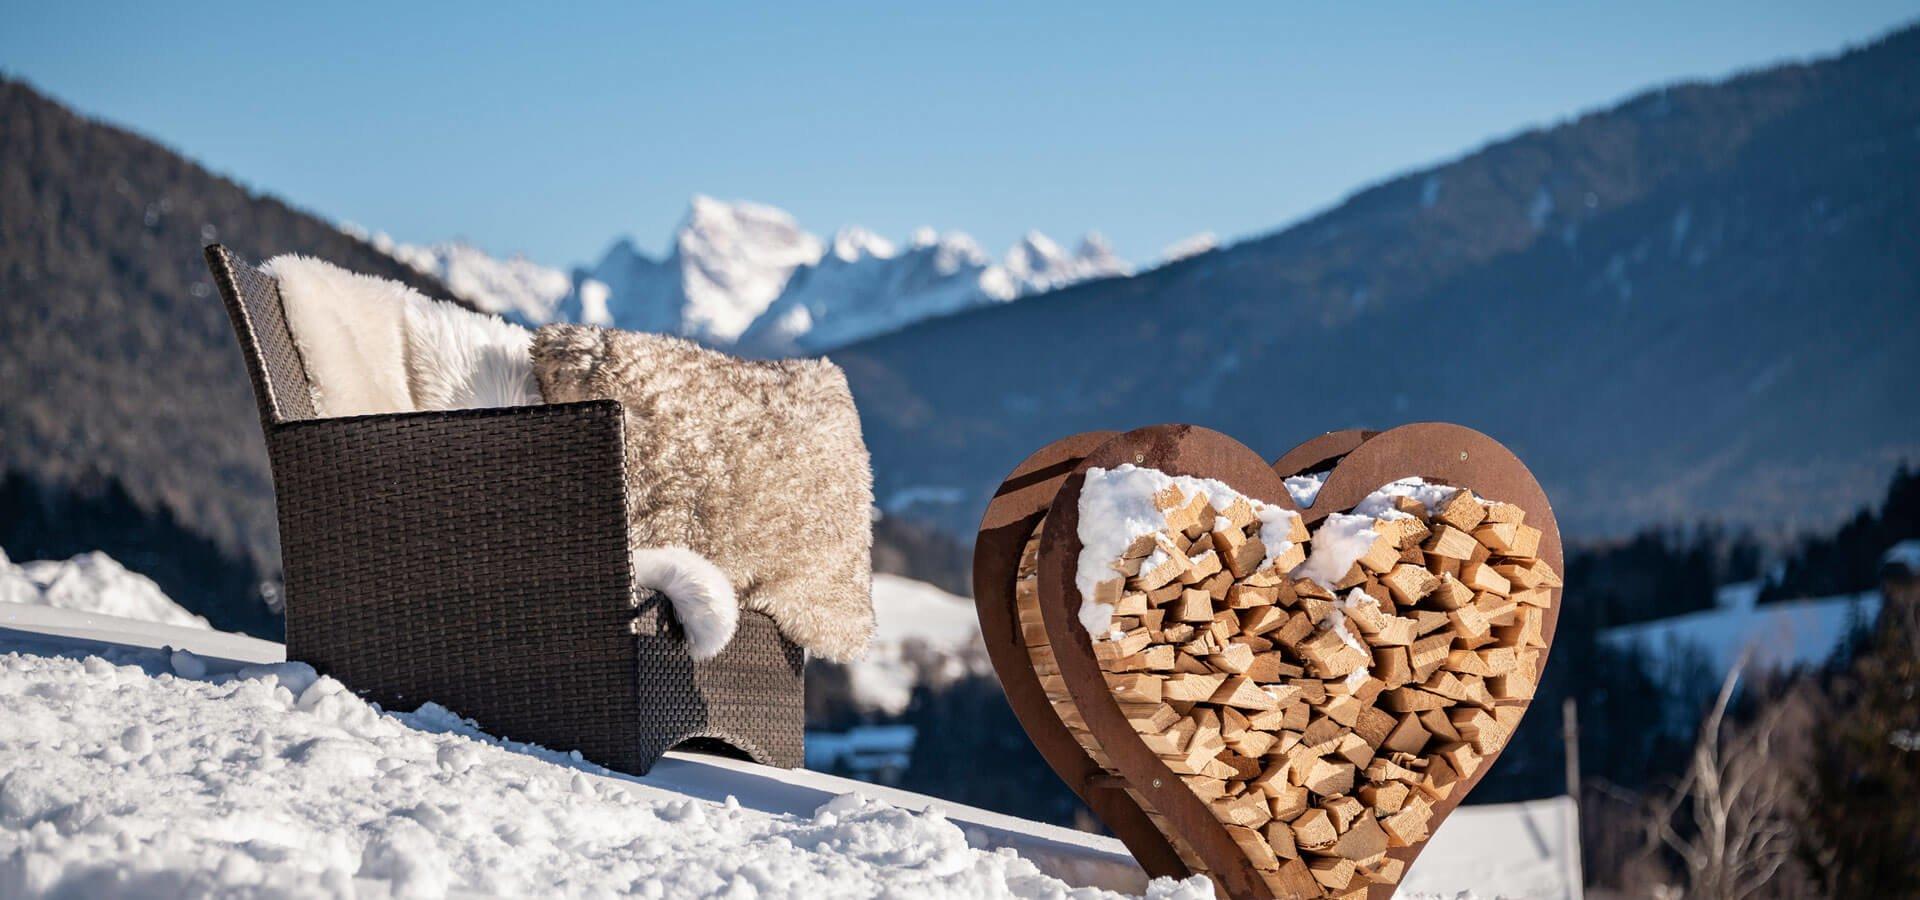 Skiurlaub am Kronplatz - Fuchshof im Pustertal